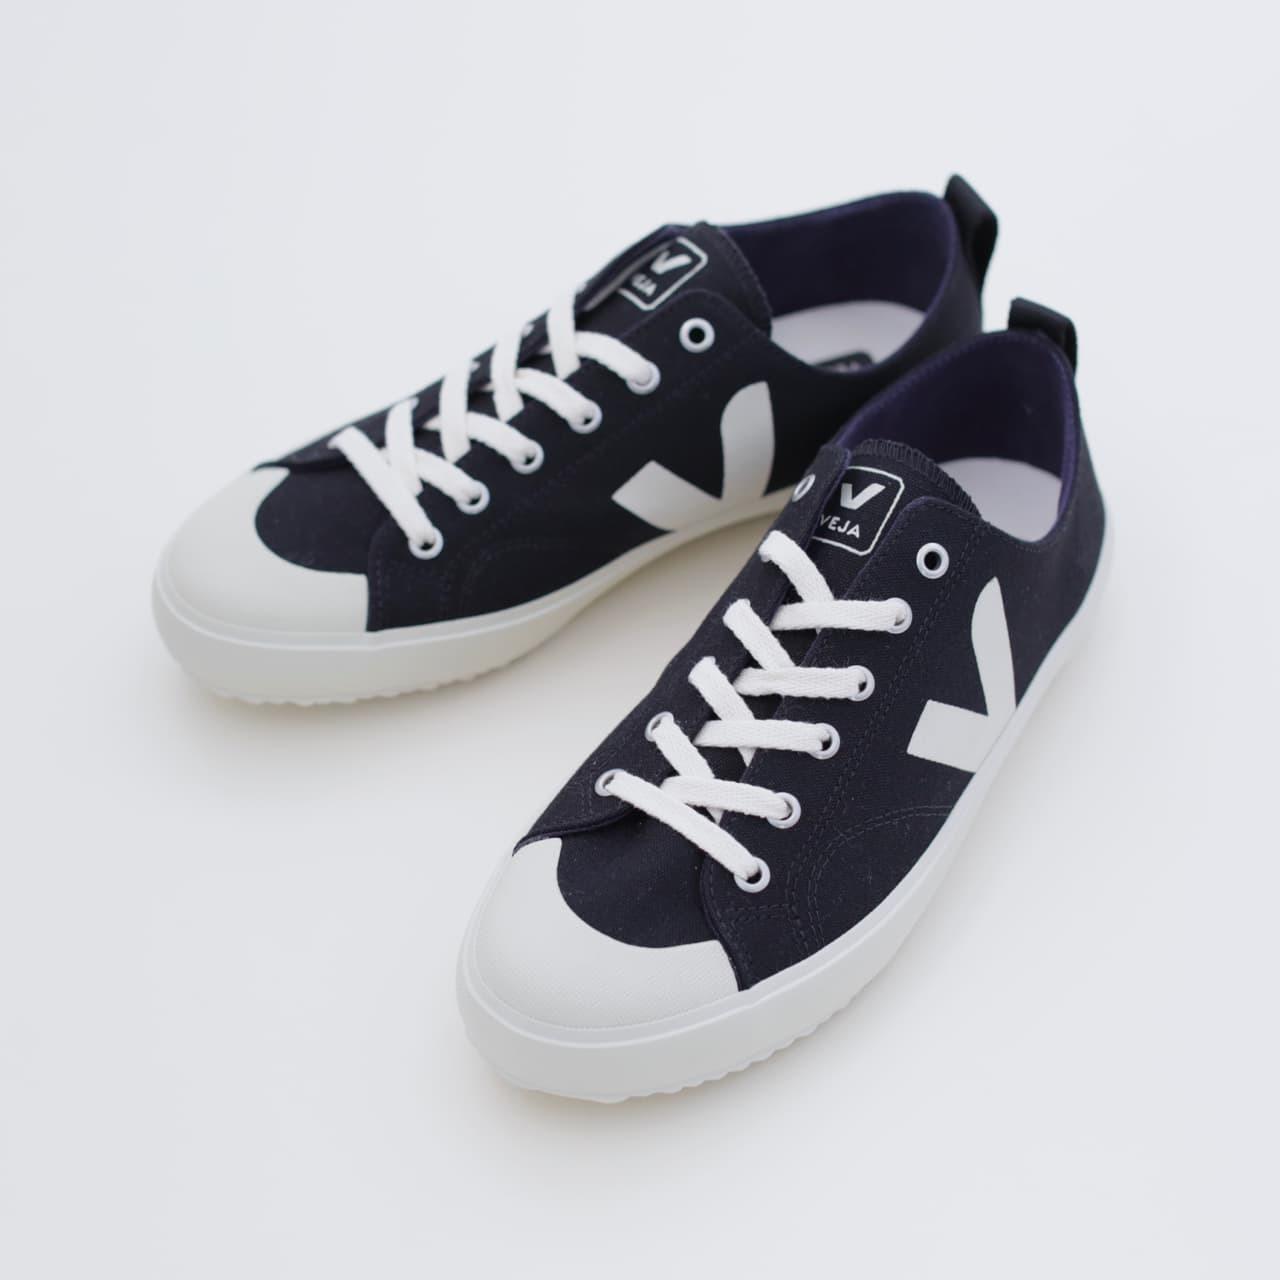 NOVA veja-sneakers-ladys-style-nova